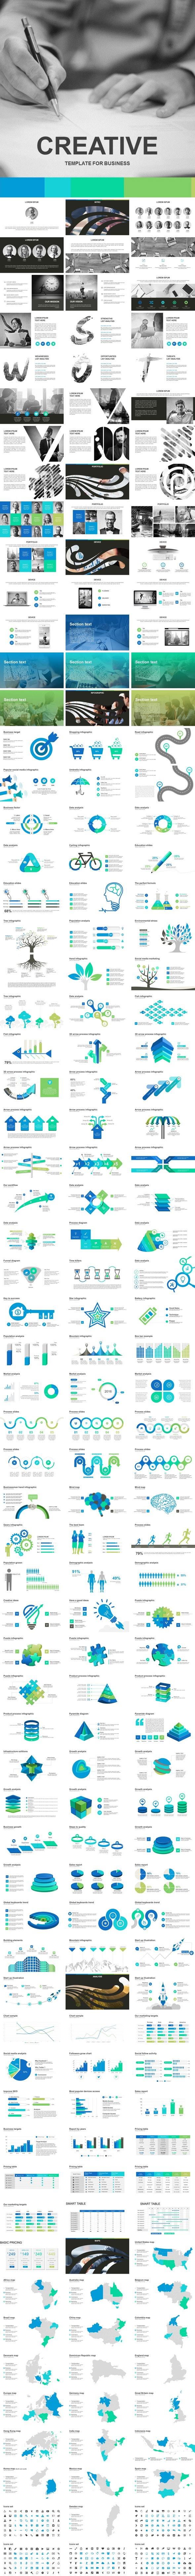 Creative Powerpoint Template - Creative PowerPoint Templates